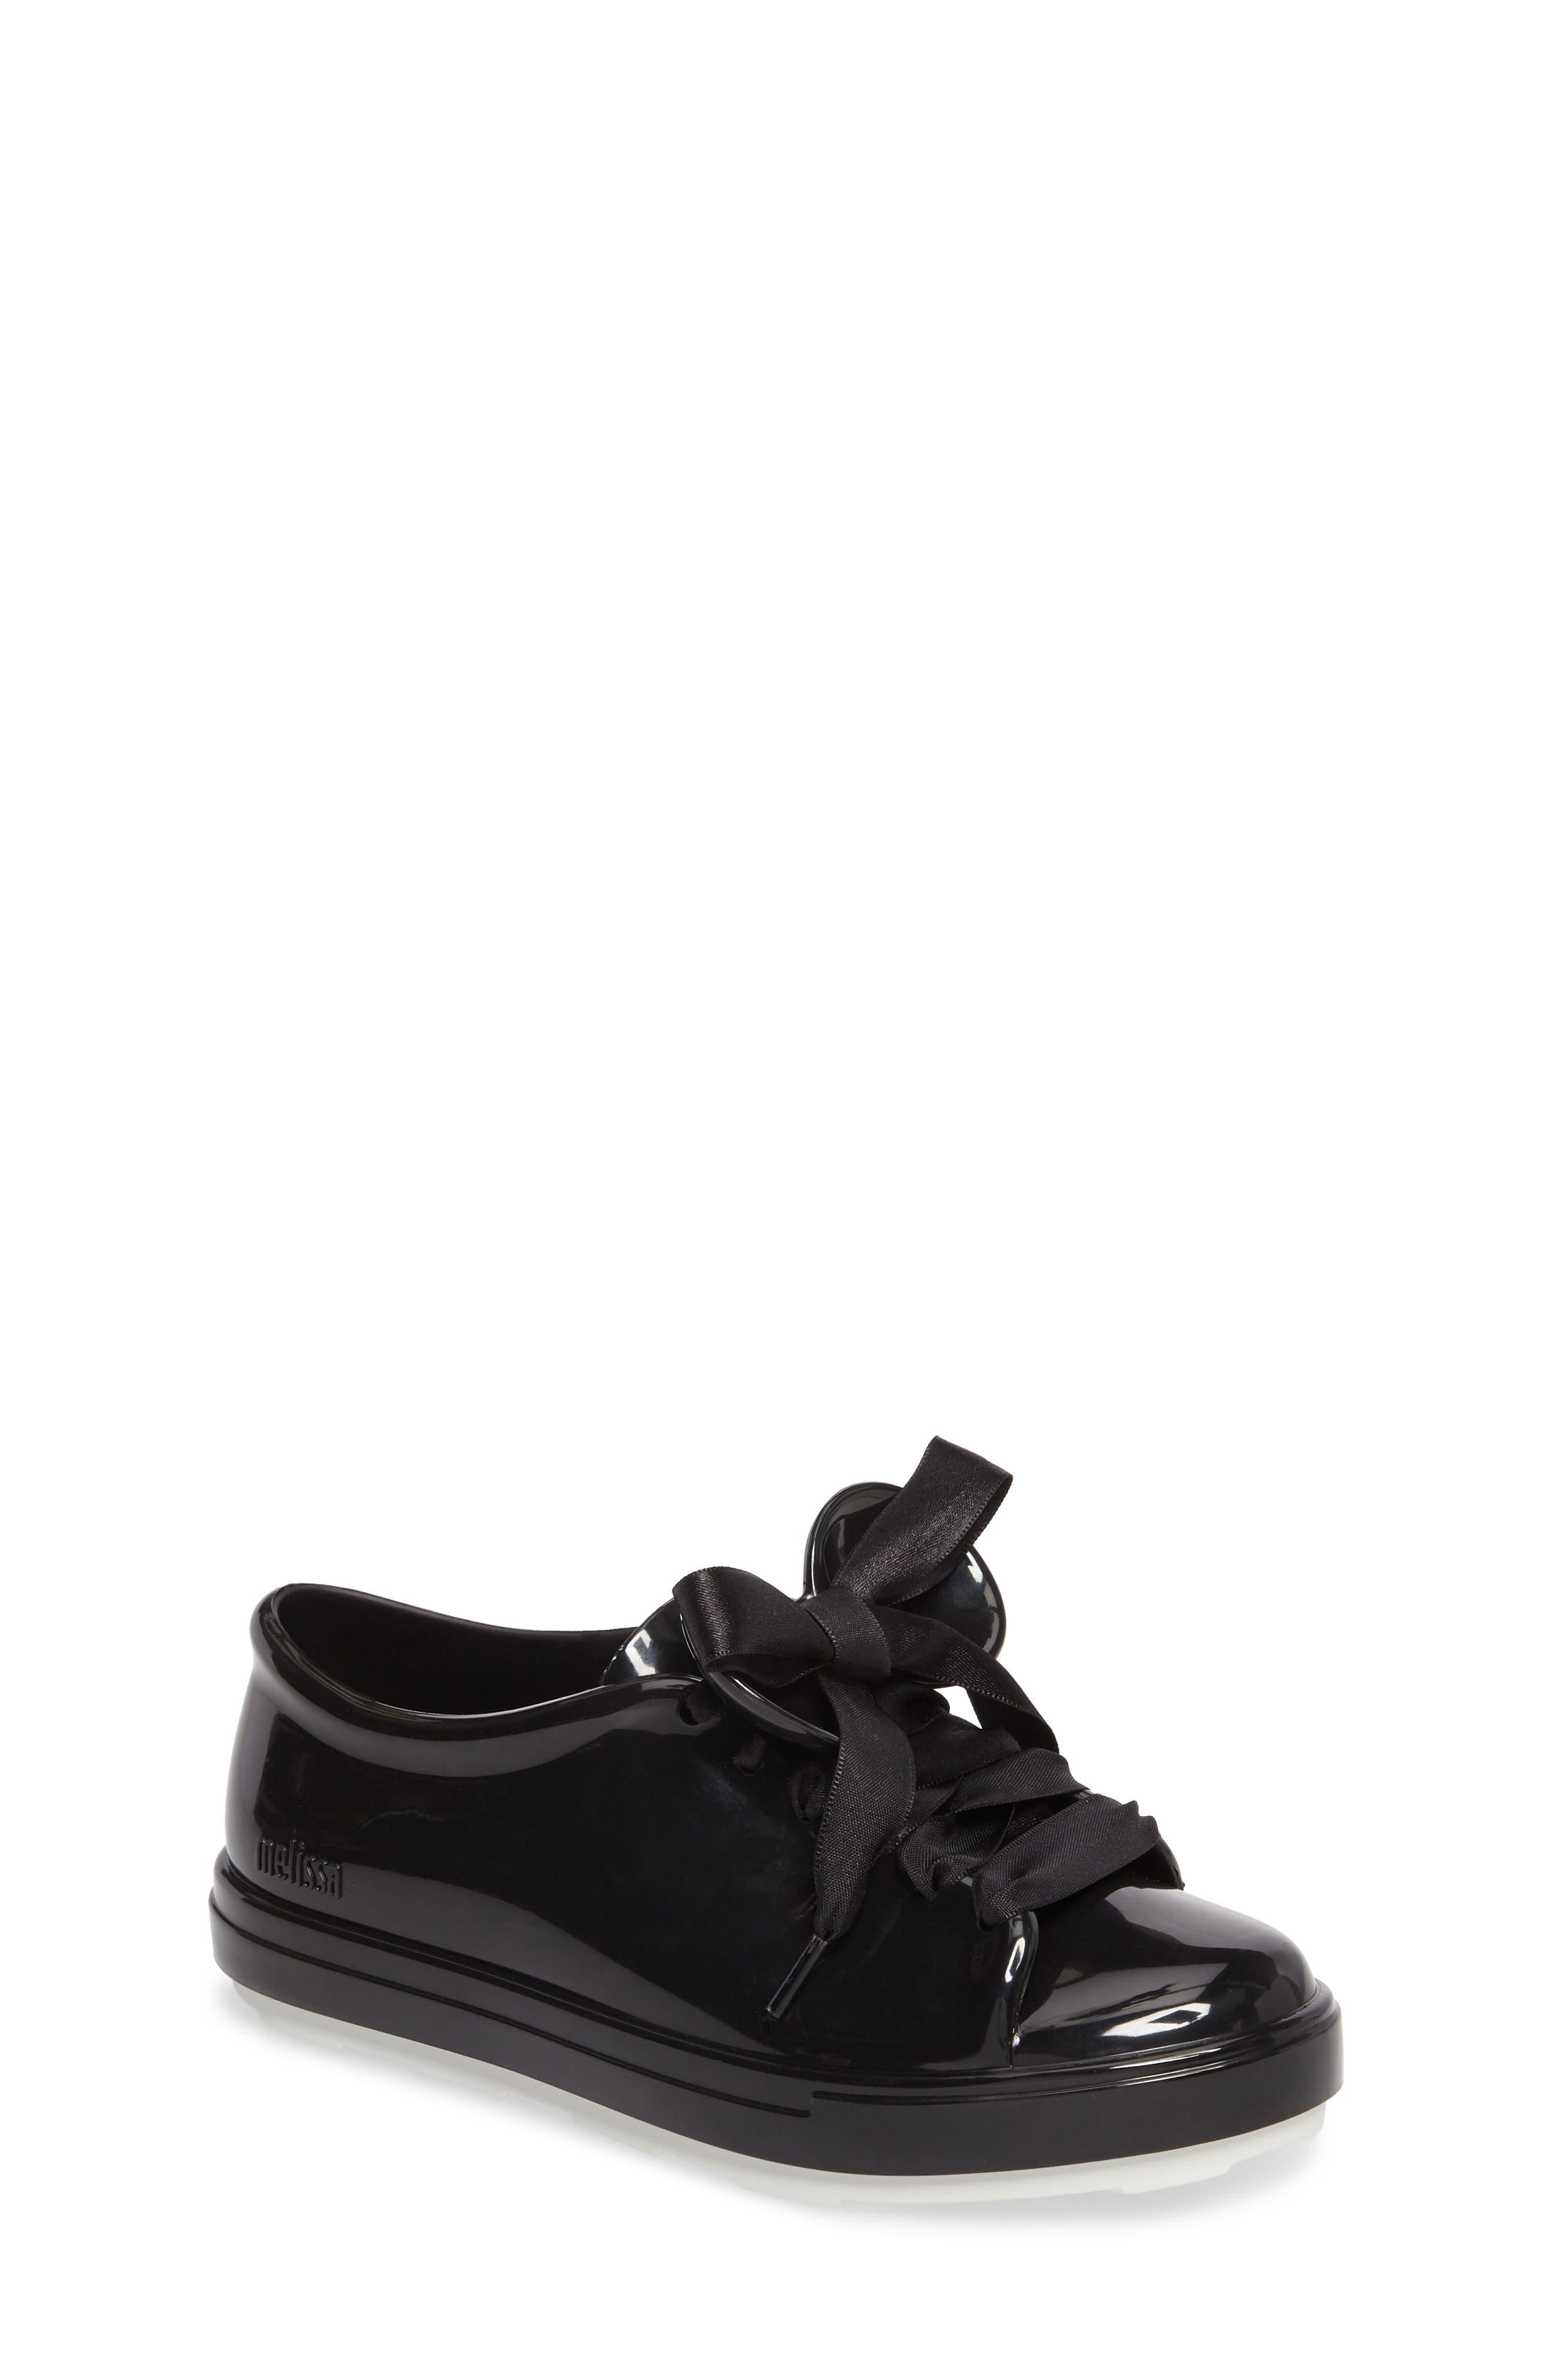 Main Image - Mel by Melissa Ultragirl + Disney® Sneaker (Toddler, Little Kid & Big Kid)